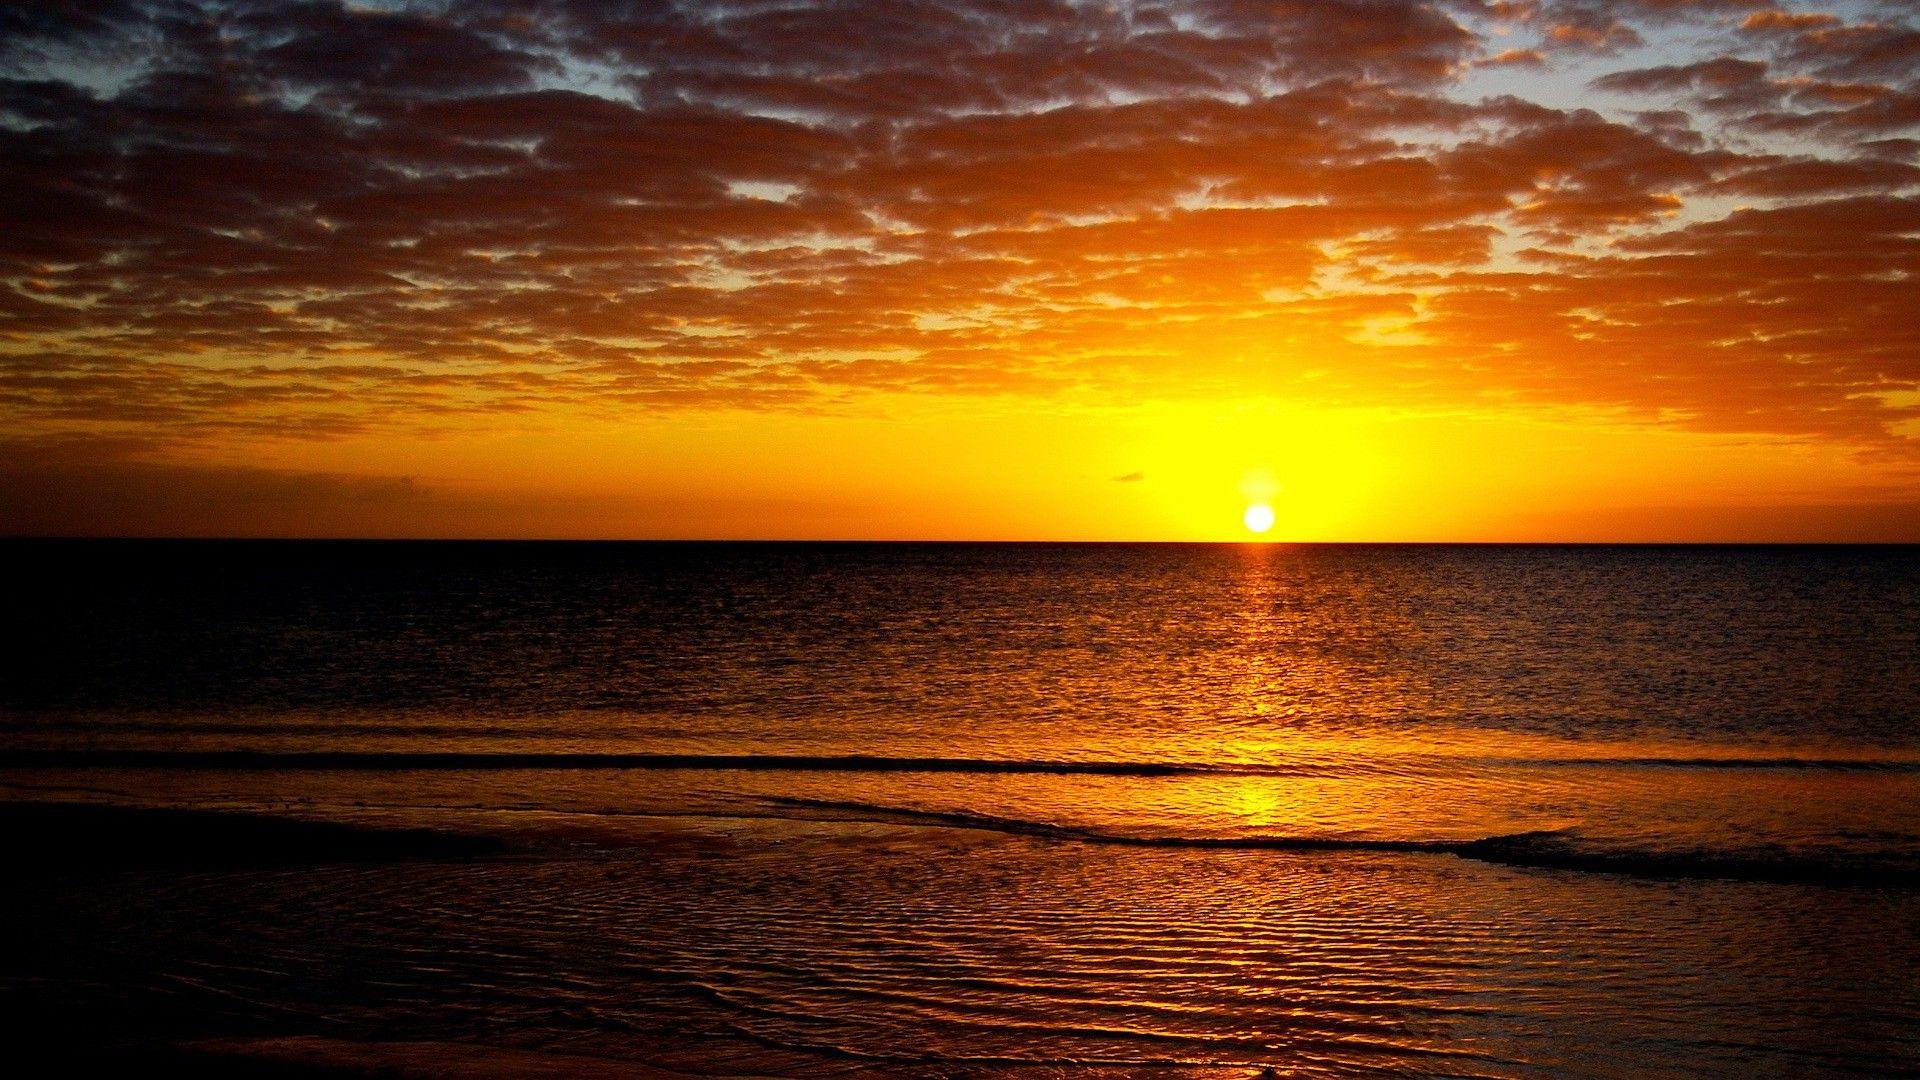 pin golden sunset hd - photo #35